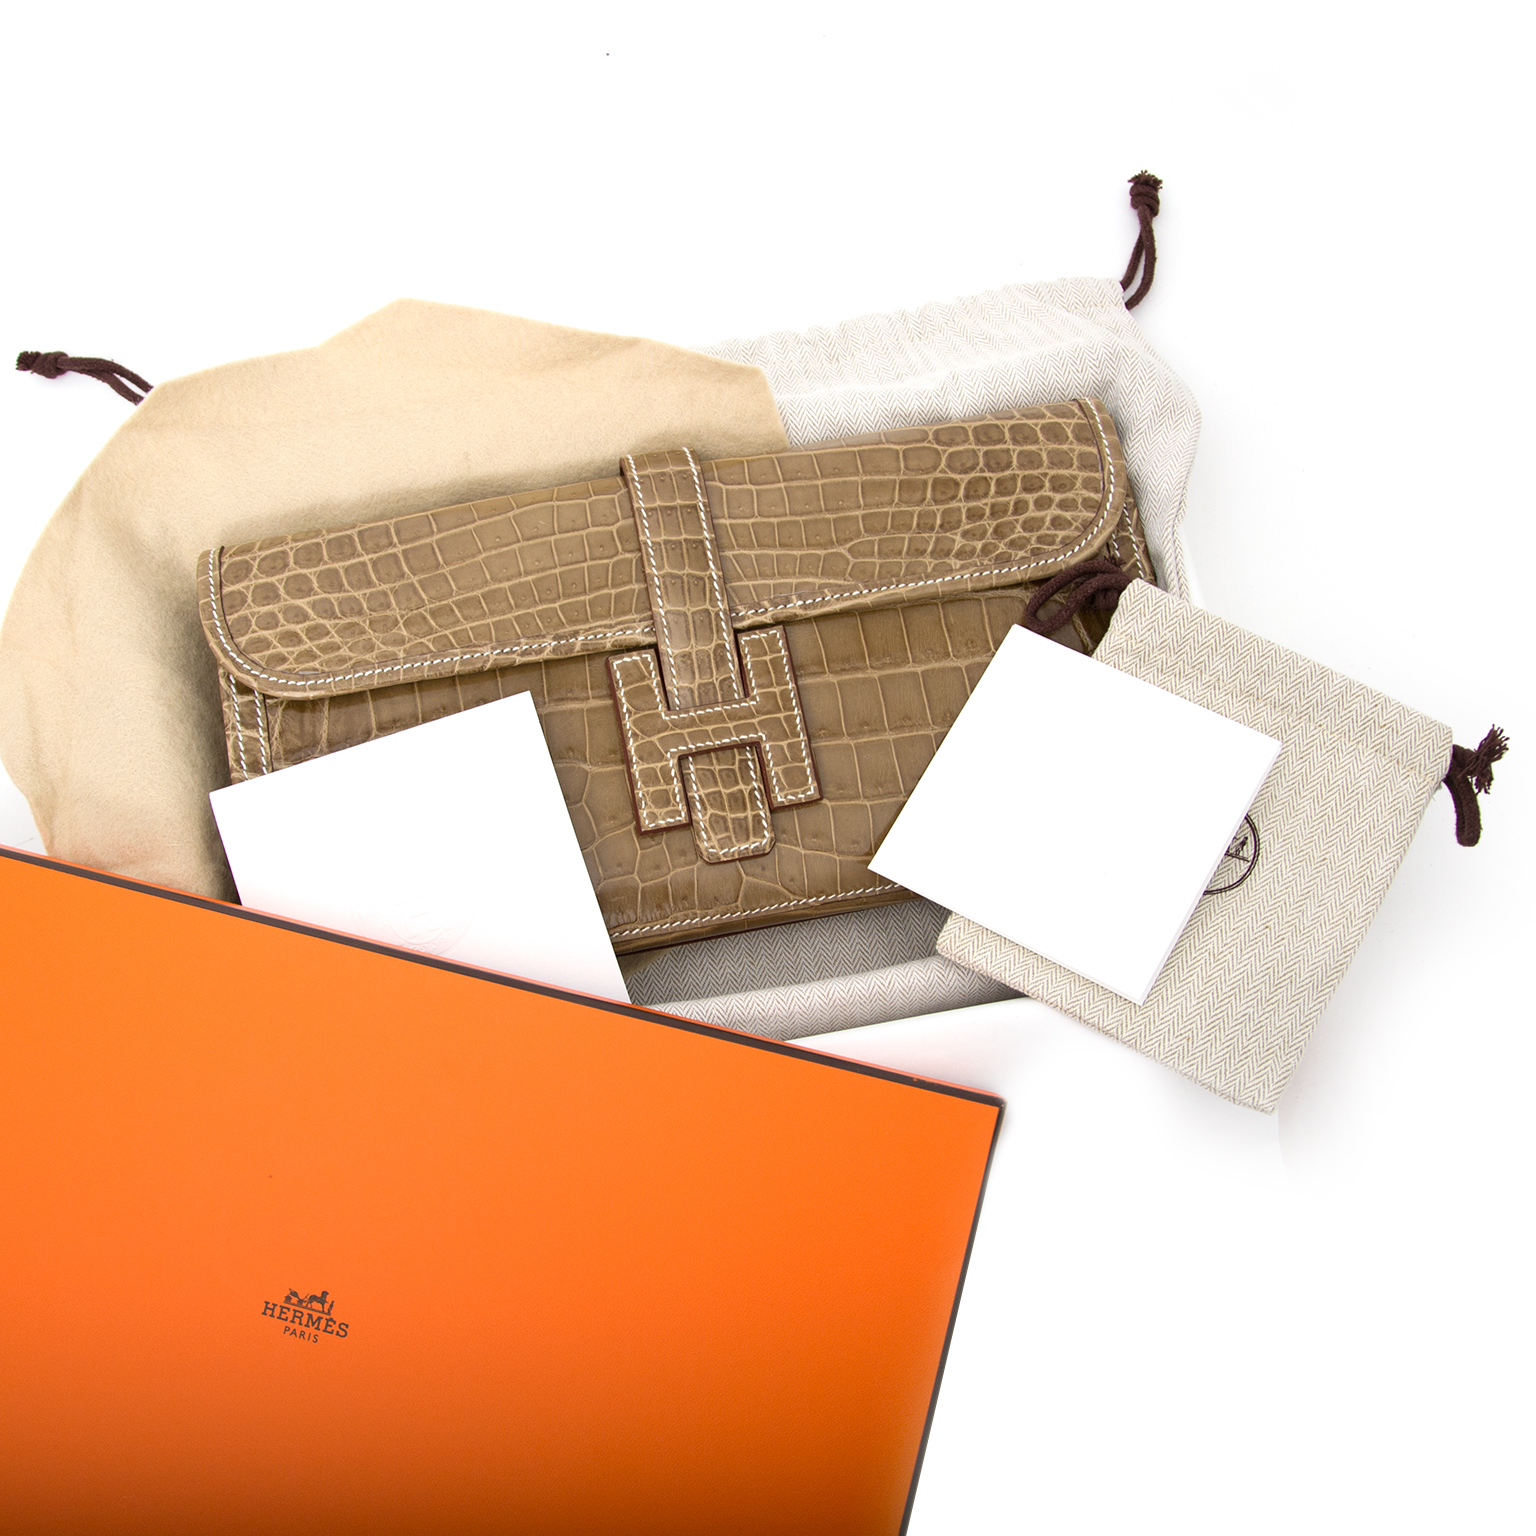 worldwide shipping brand new Hermès Pochette Jige Elan 29 Crocodile Niloticus Lisse Ficelle